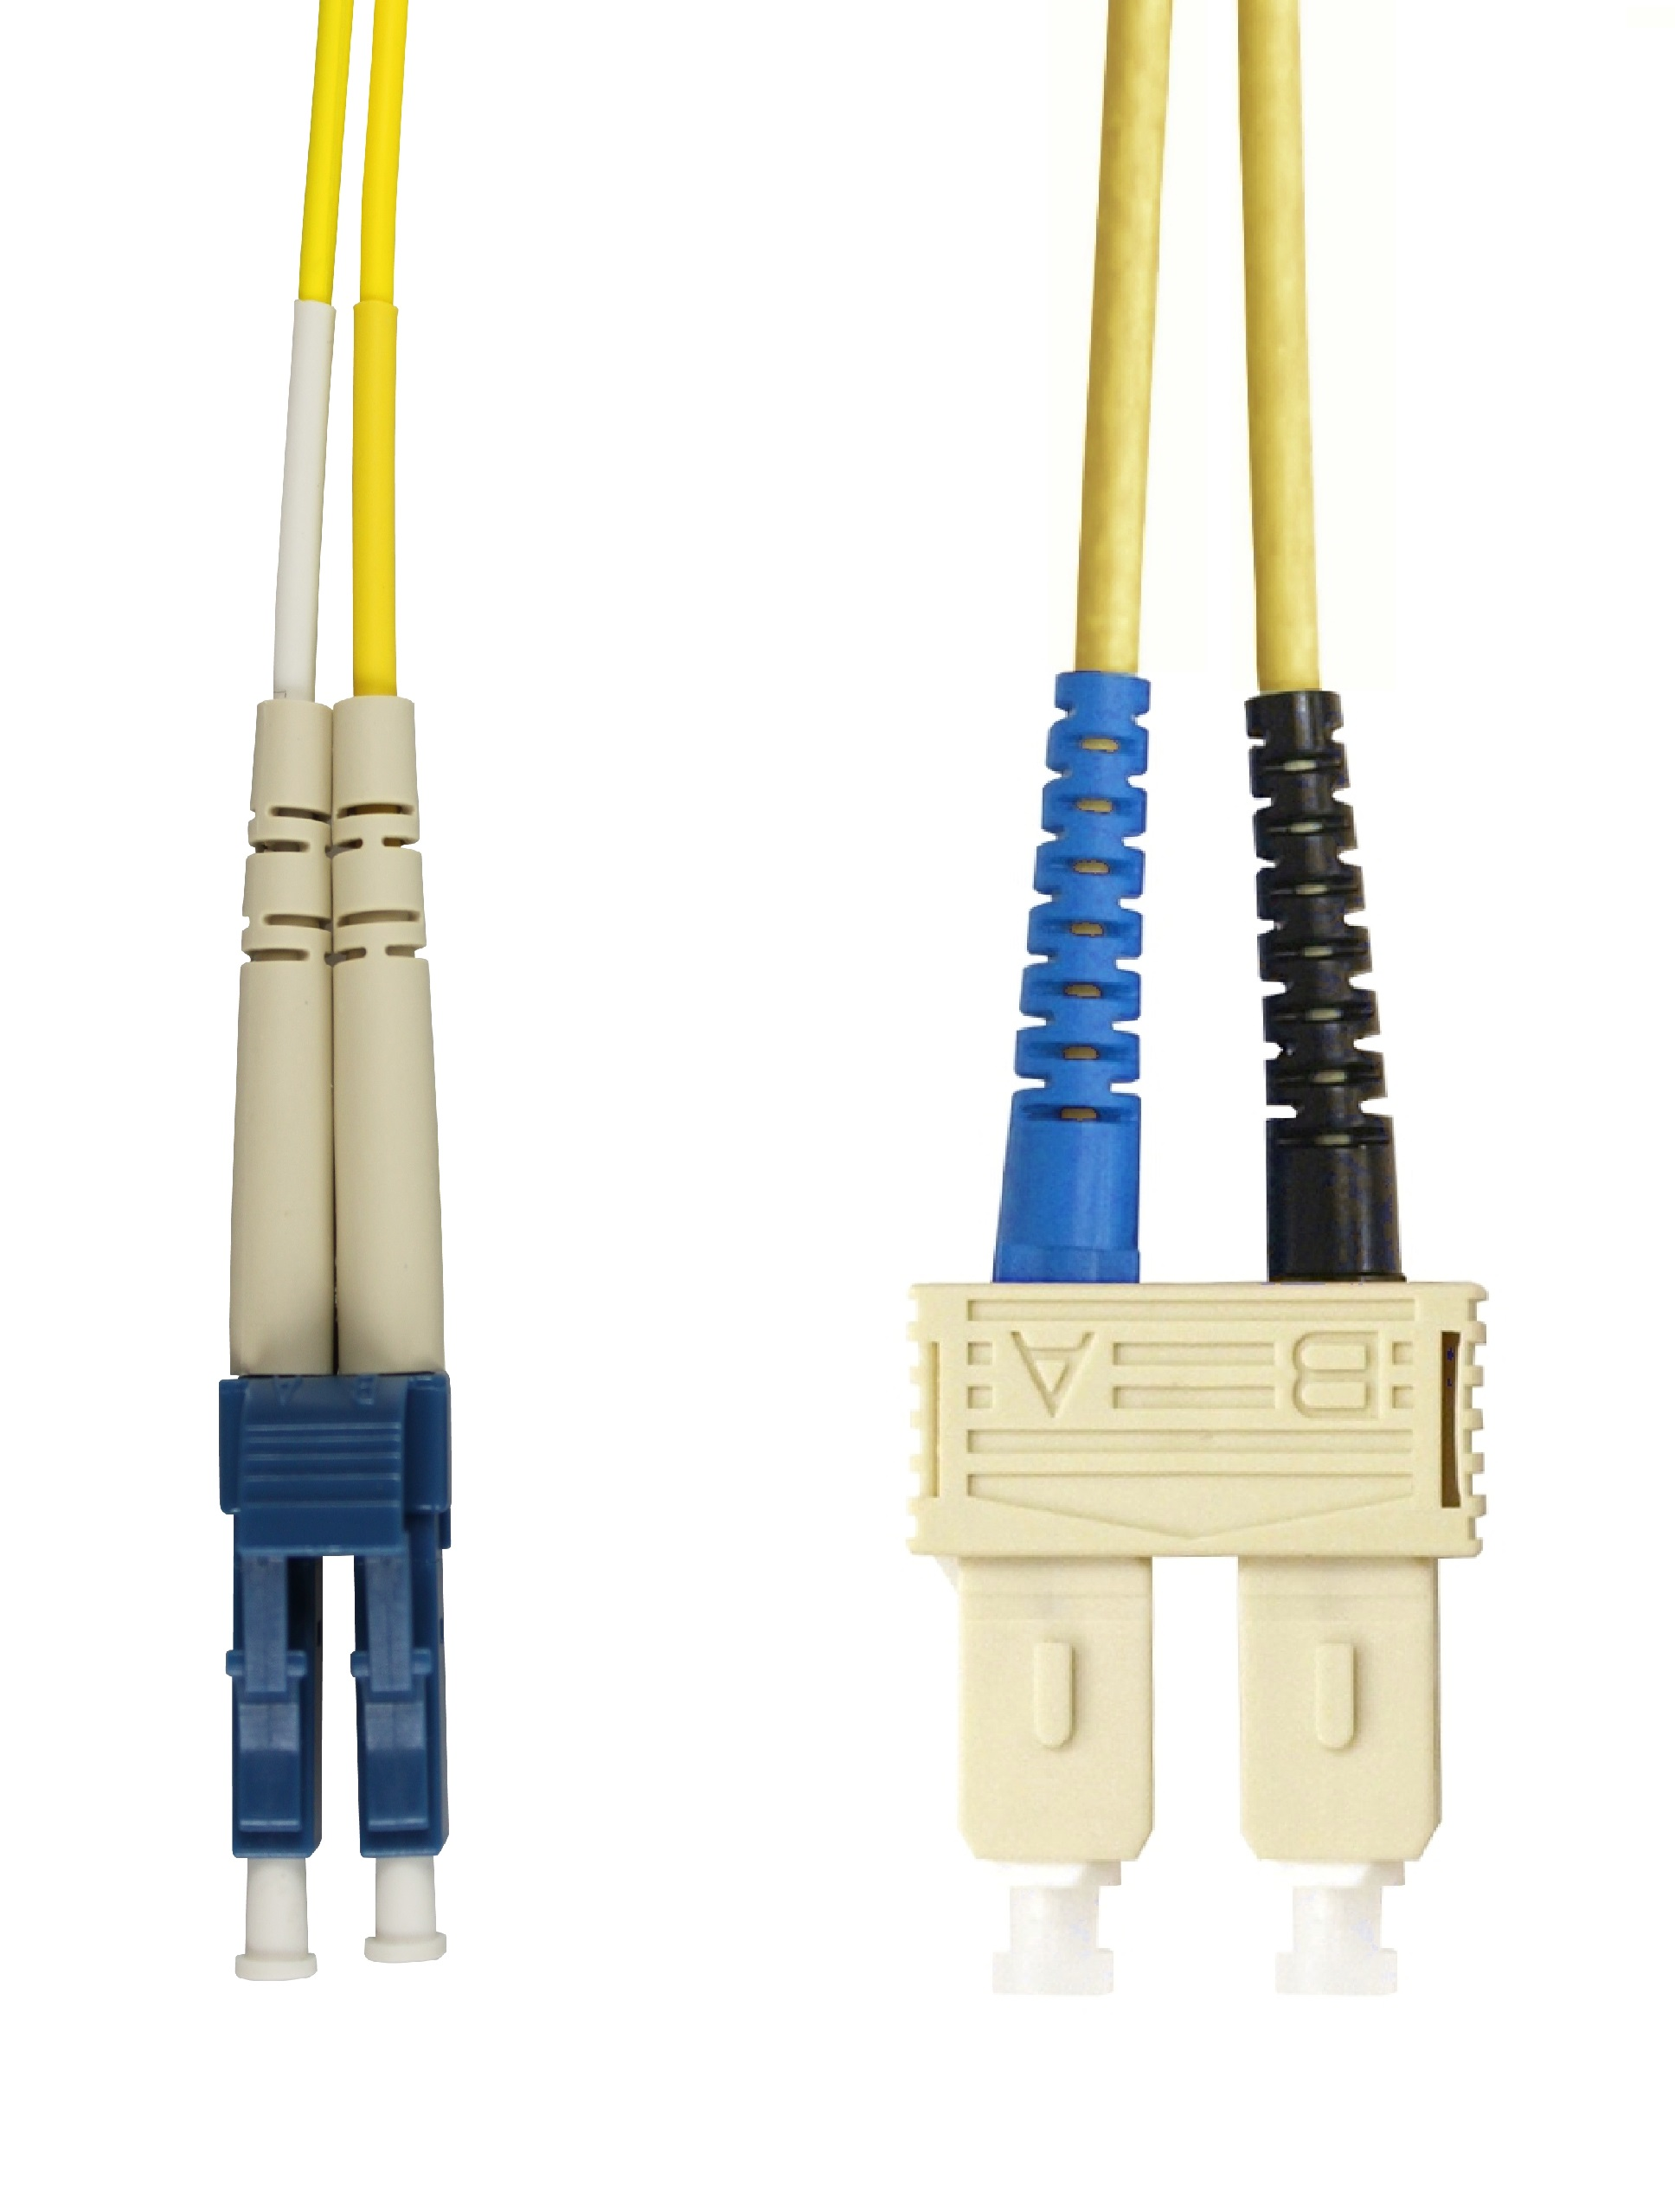 1 Stk LWL Patchkabel Duplex LC/SC, 9/125µm OS2, LS0H-3, gelb, 1.0m HLP29LC01F